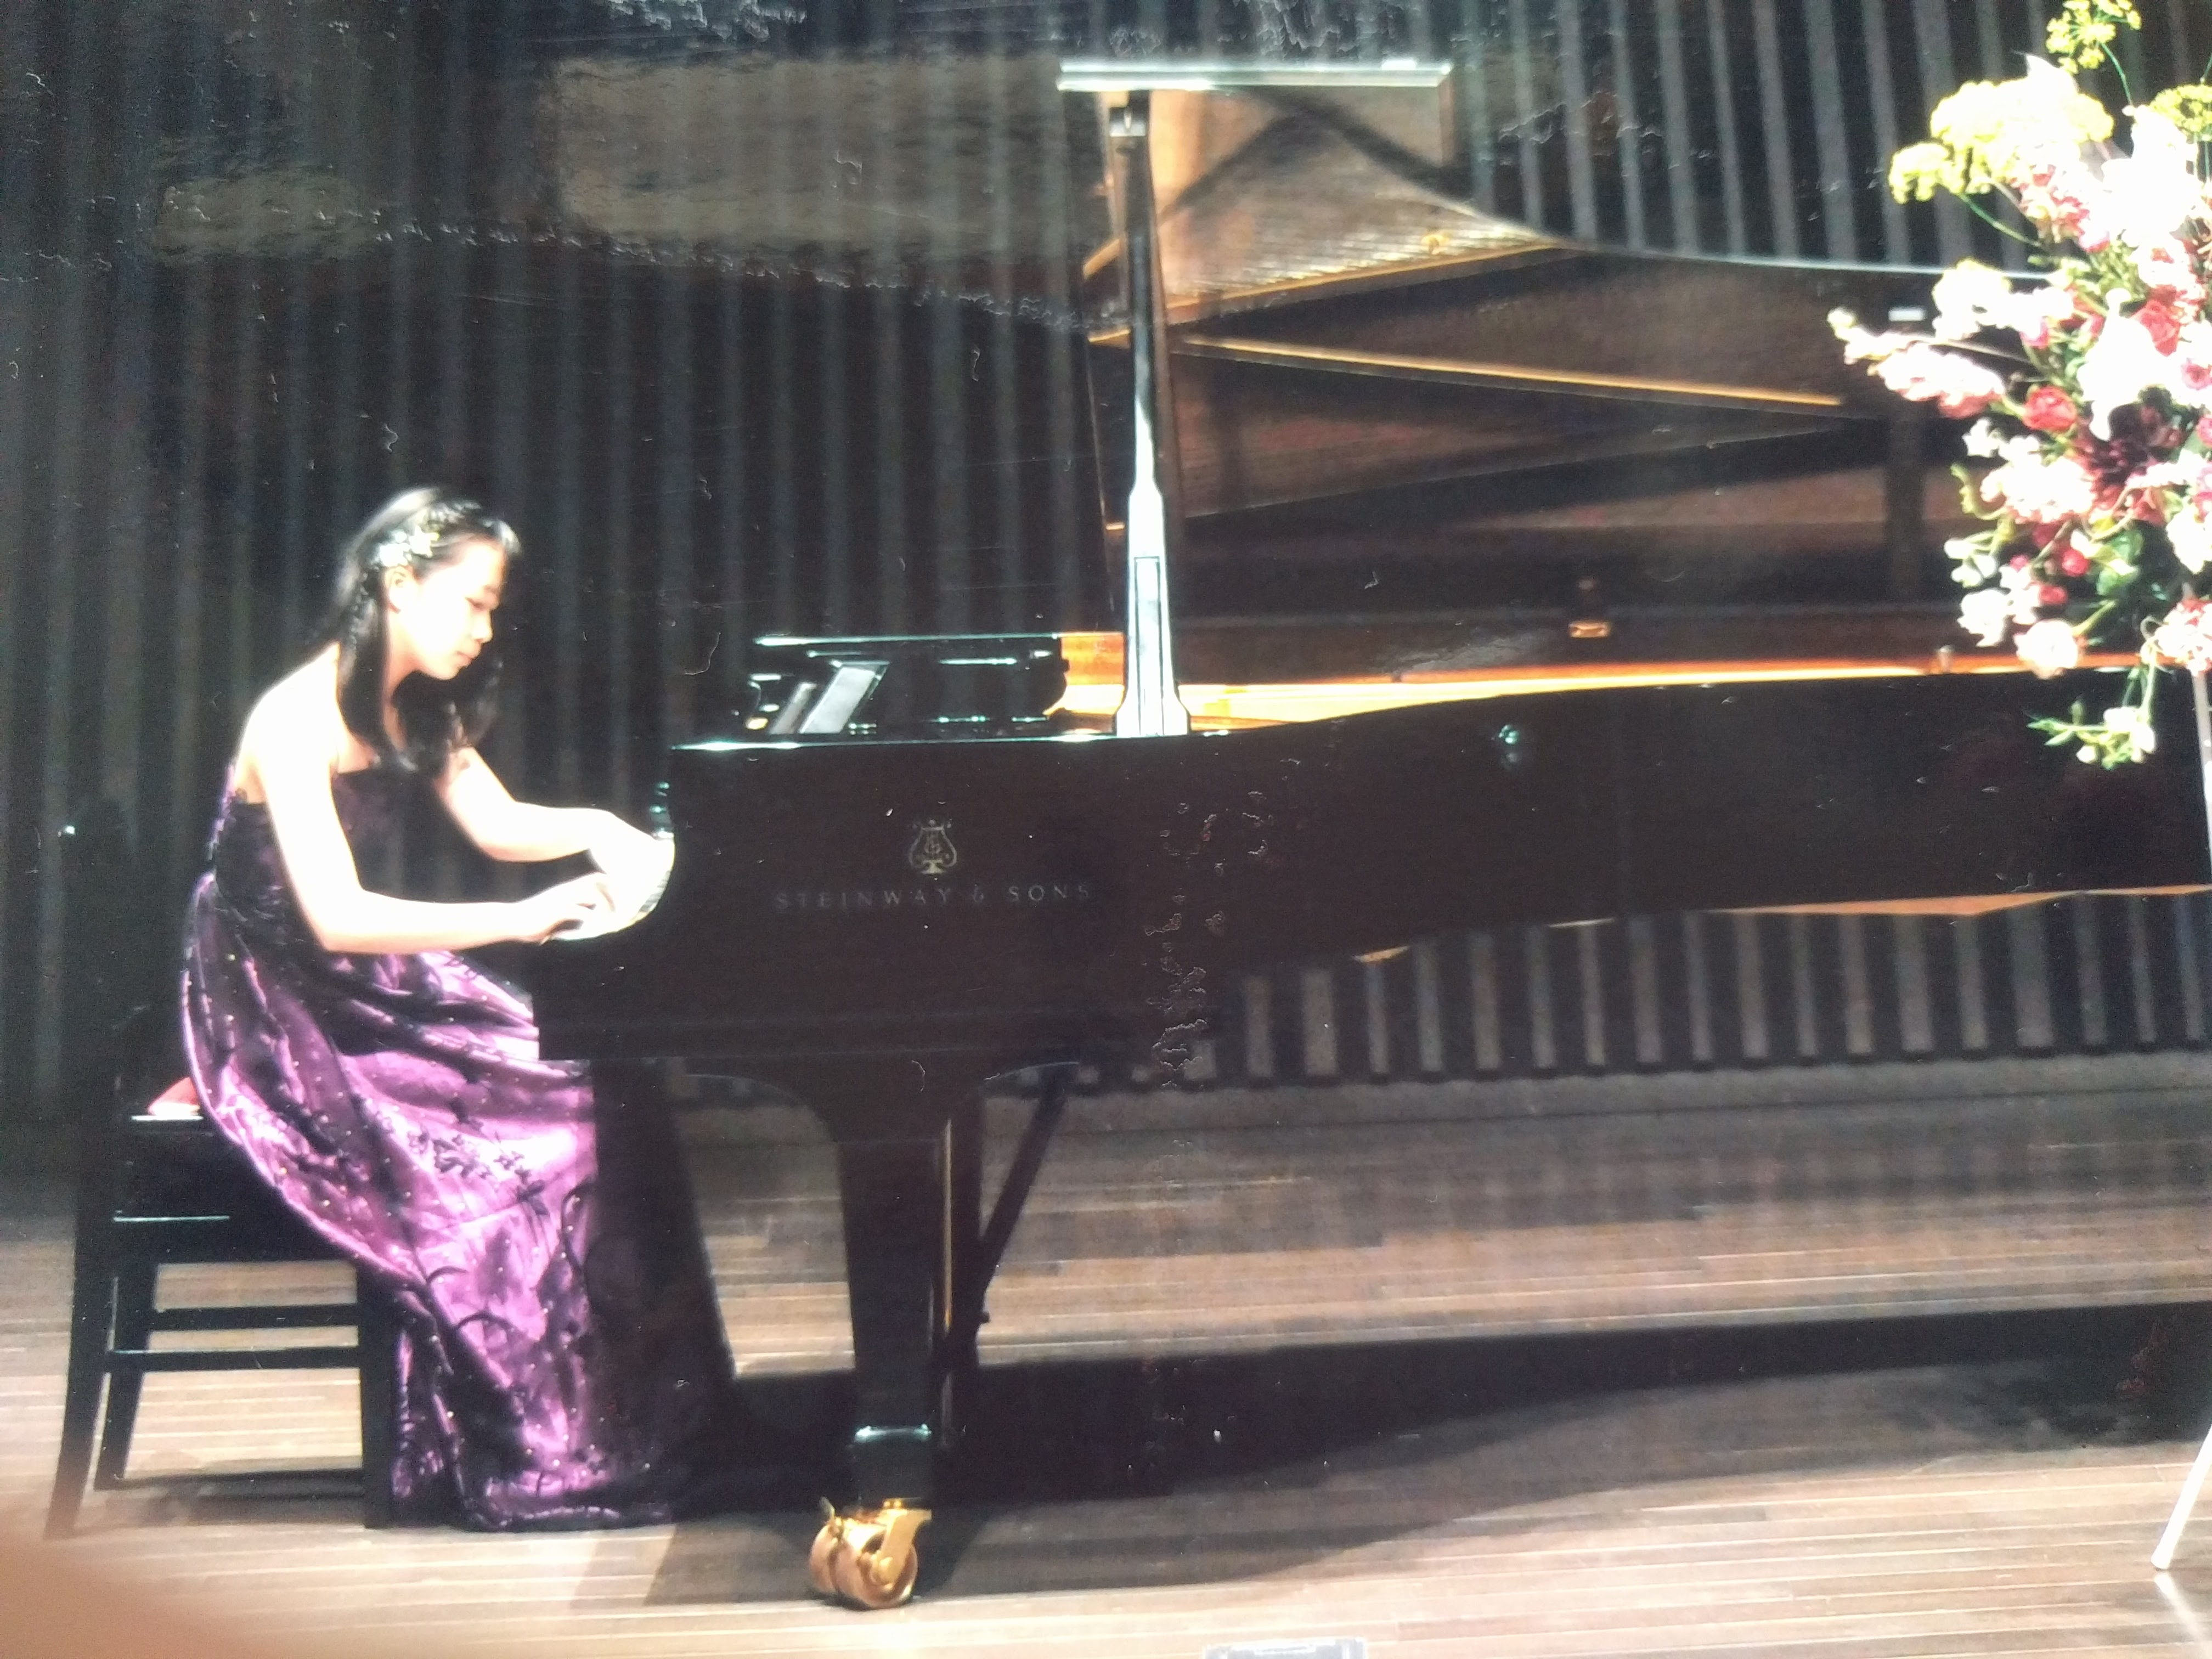 Maple音楽教室♪立川羽衣町(西国立徒歩4分 ピアノ.リトミック.声楽